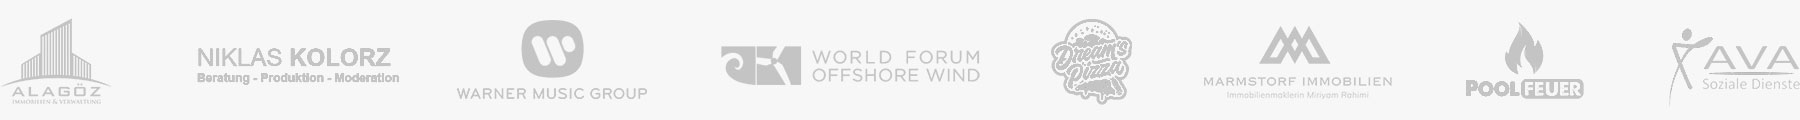 Logos unserer Kunden: Alagöz Immobilien, Niklas Kolorz, Warner Music Group, World Forum Offshore Wind, Dreams Pizza, Marmstorf Immobilien, Poolfeuer, Ava Soziale Dienste